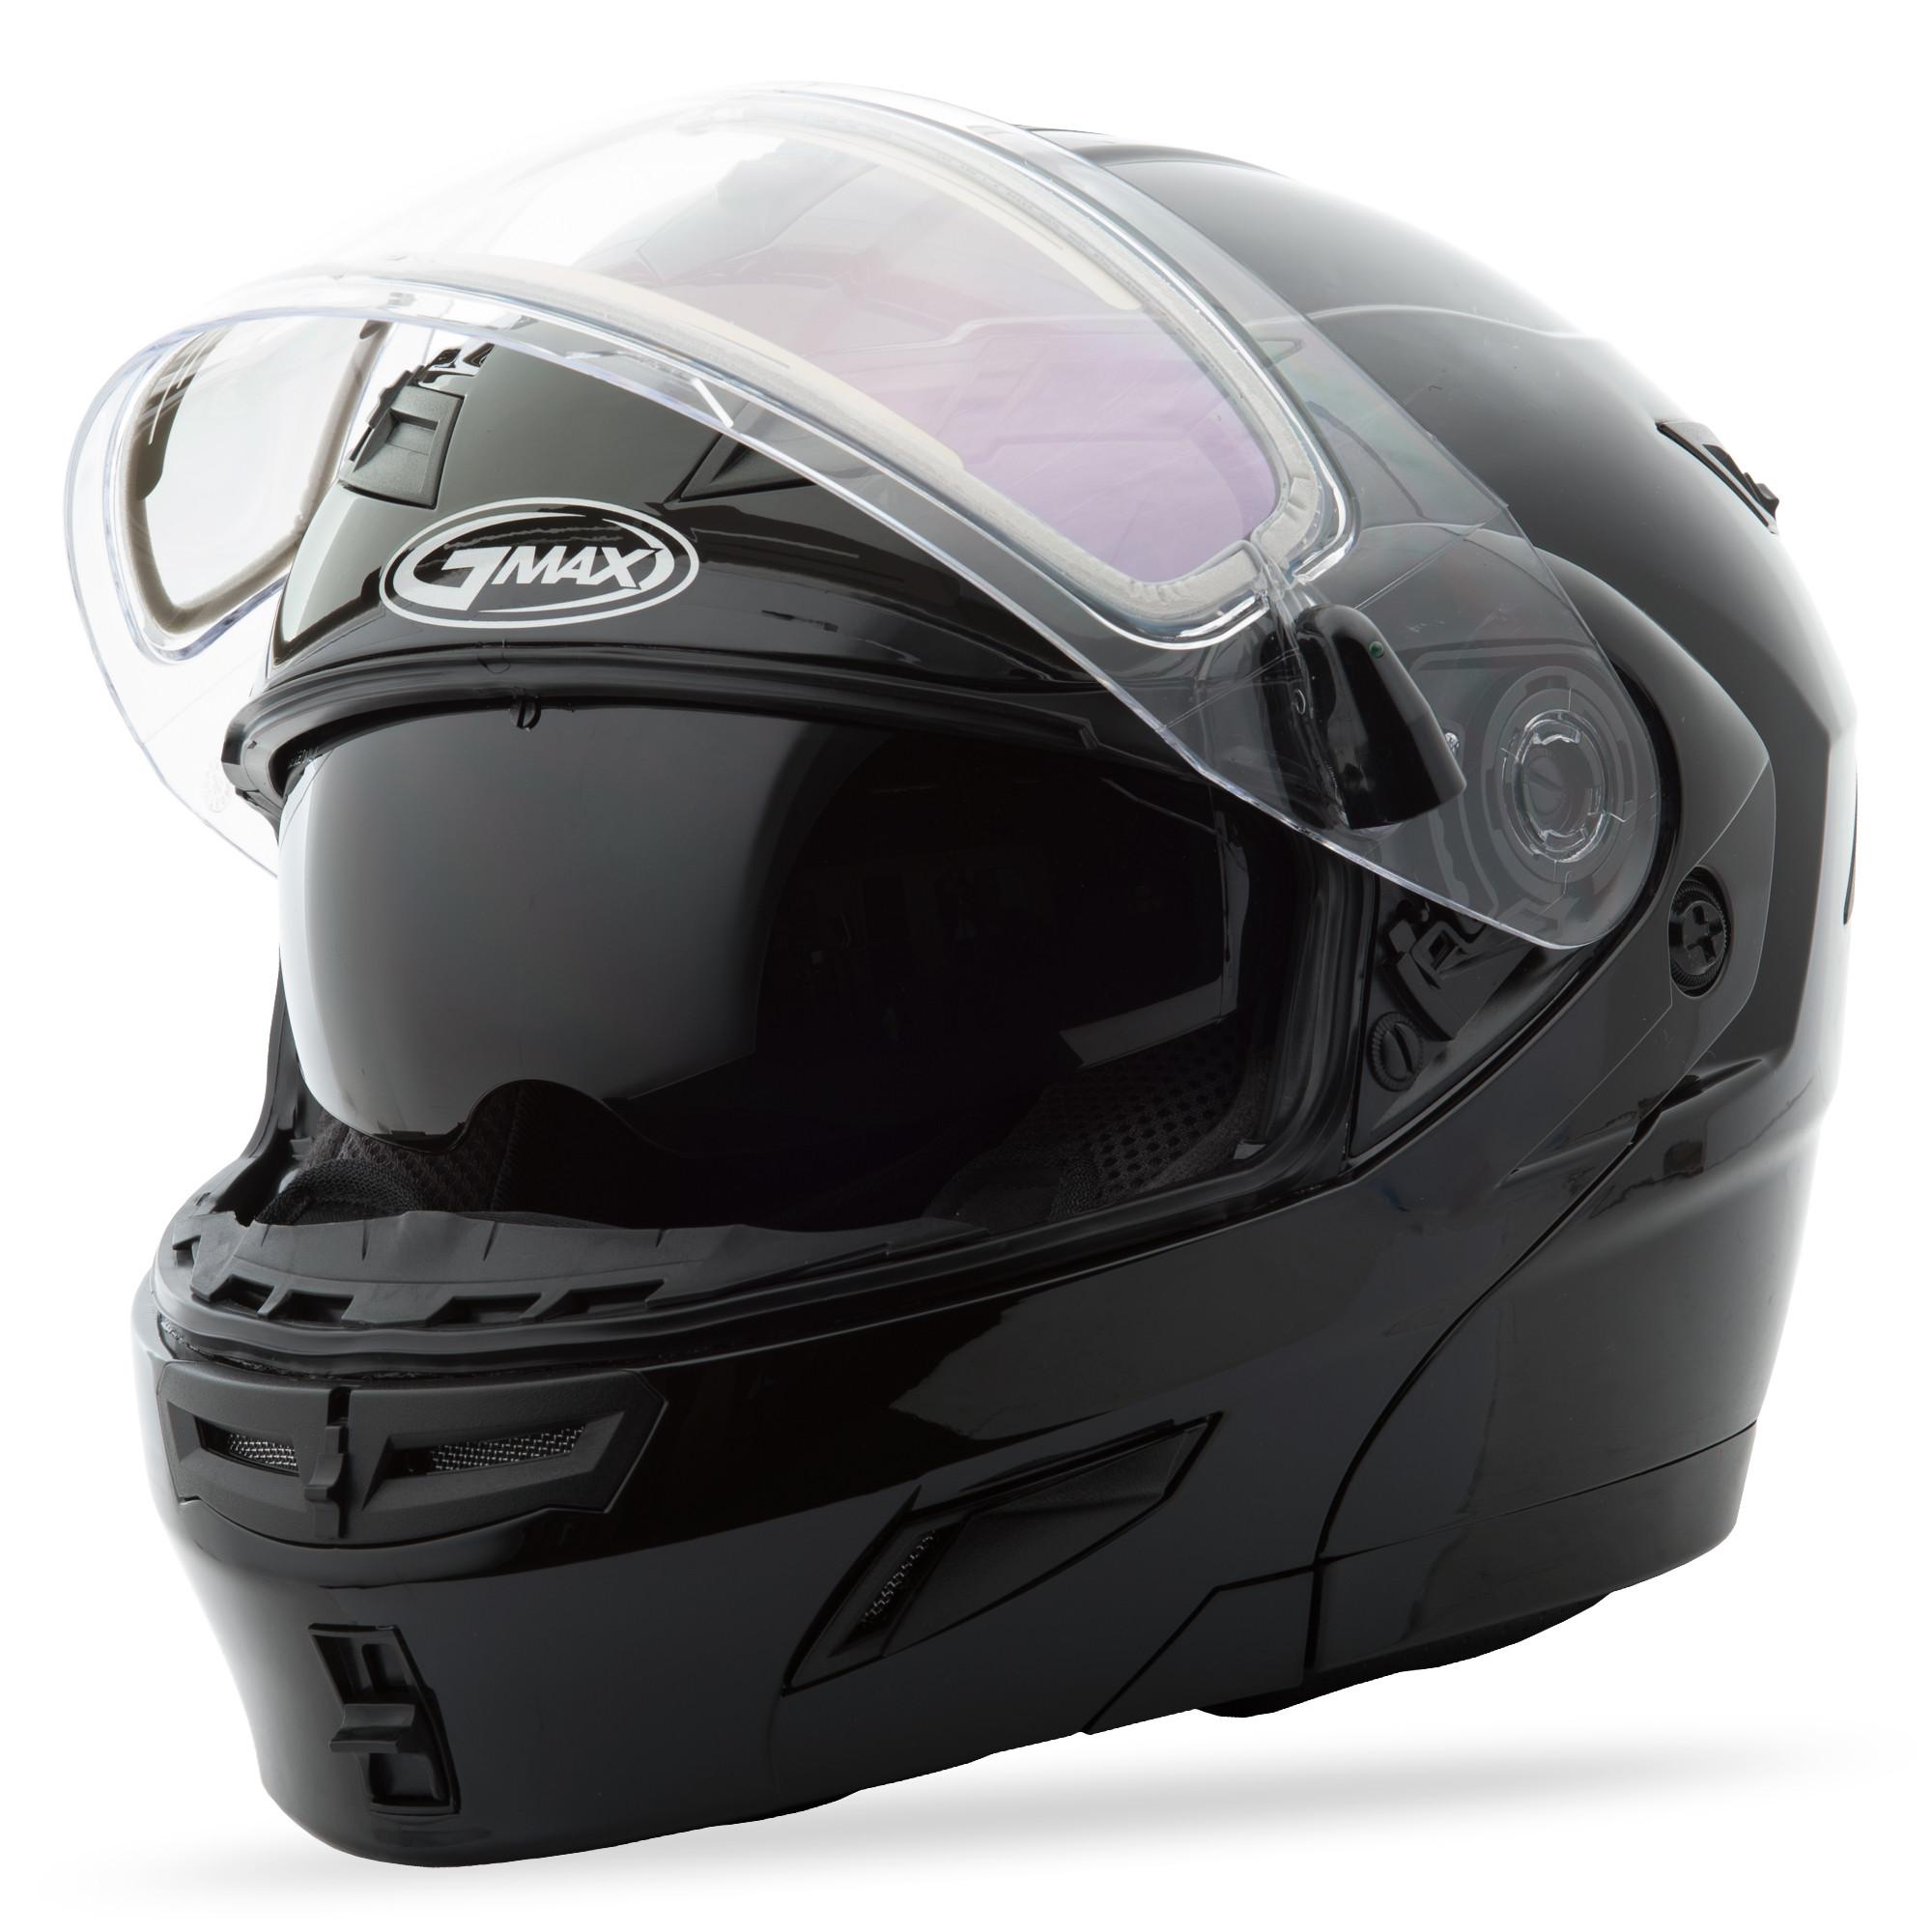 GM-54S MODULAR Snow Helmet,  W Electric SHIELD 72-6208XS